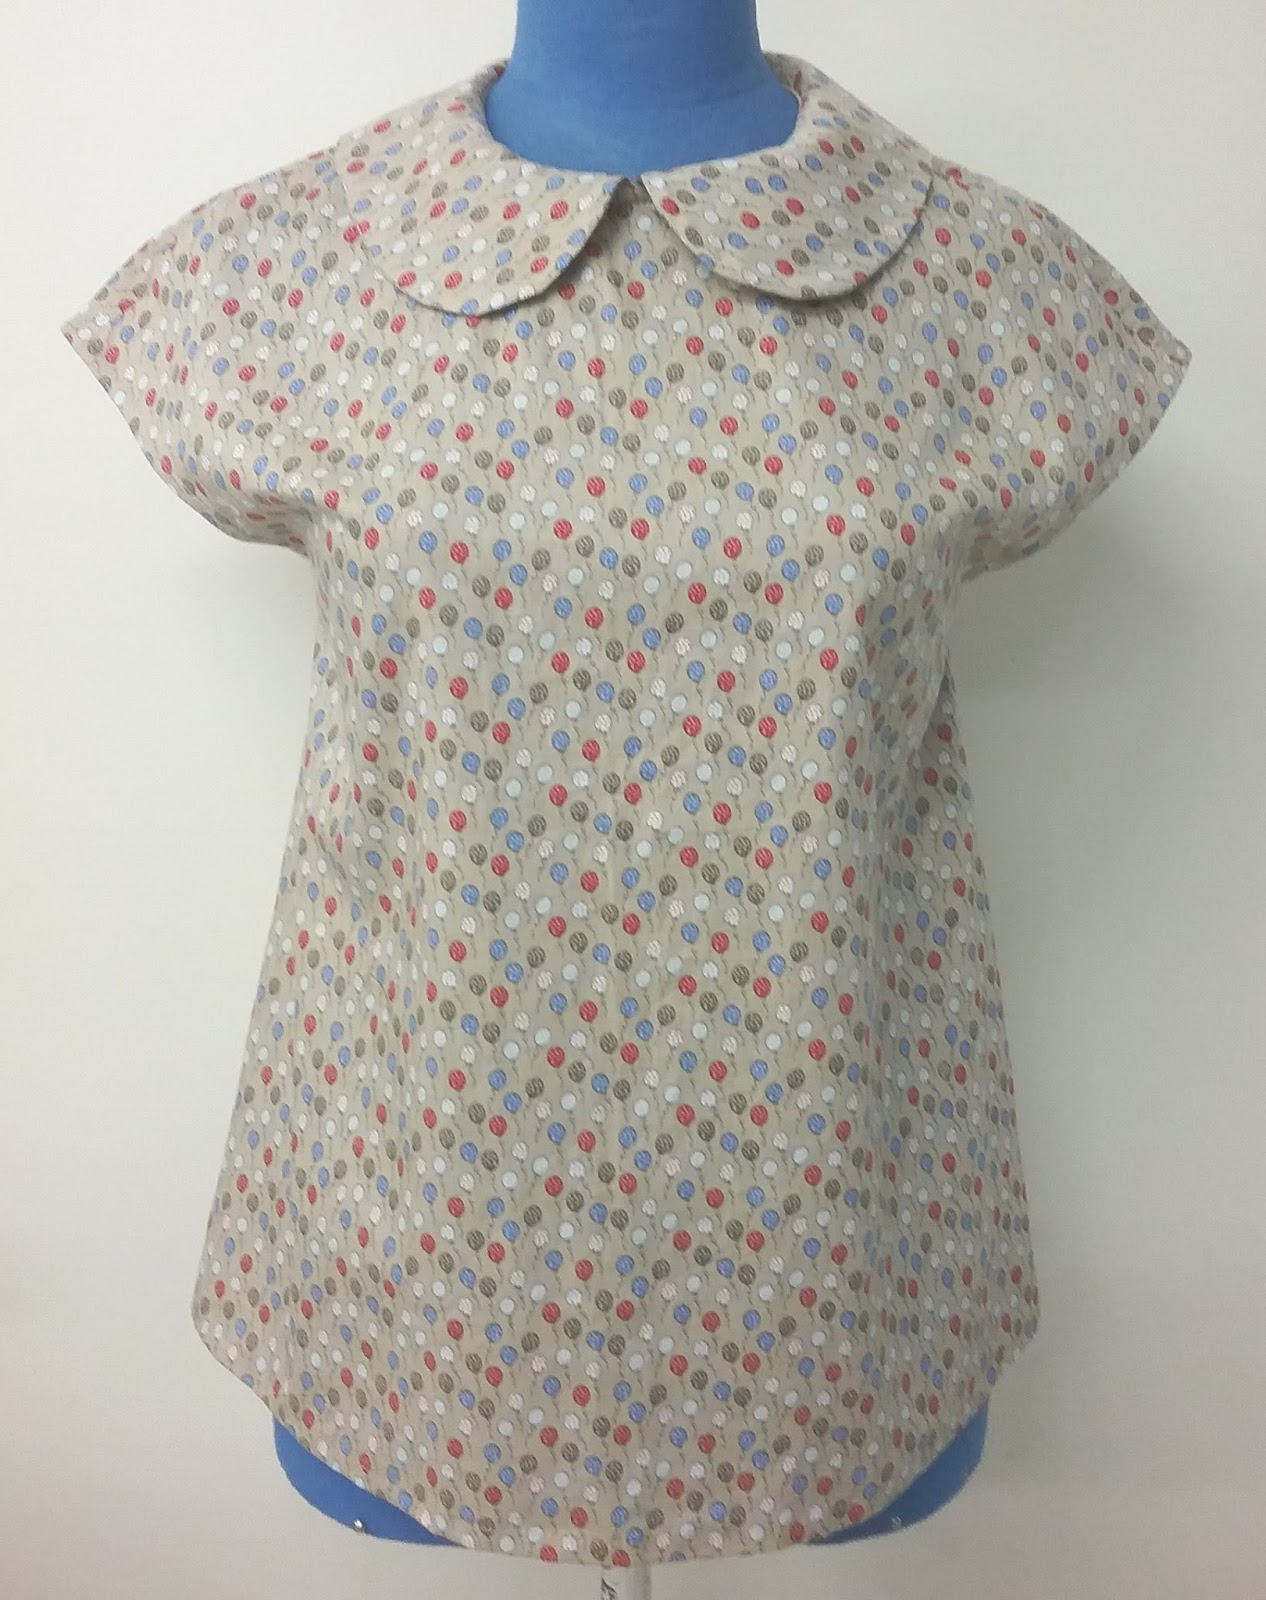 755c0ec7e Escuela de Diseño de Moda Marper  Blusa con cuello bebé